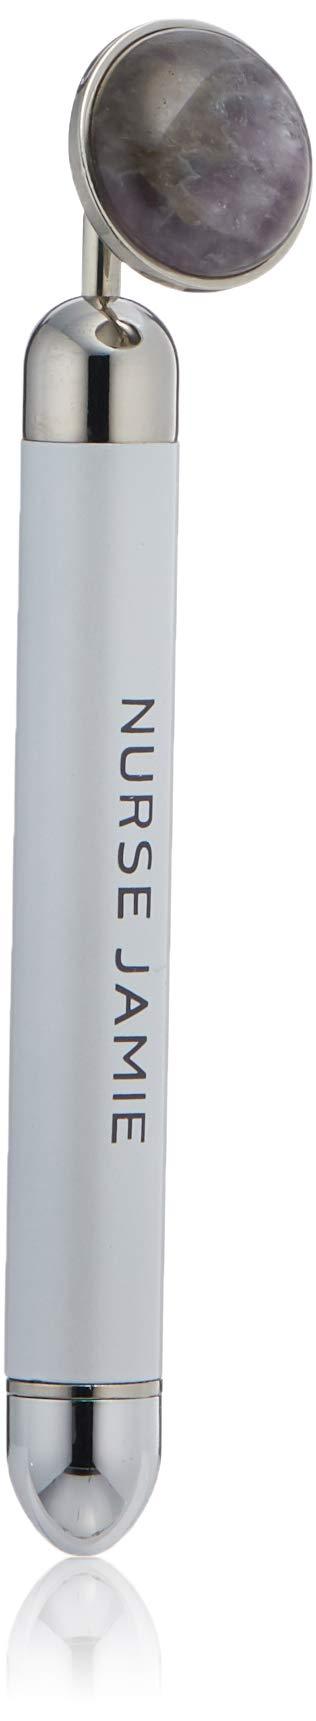 Nurse Jamie Nuvibe Rx Amethyst Massaging Beauty Tool by Nurse Jamie